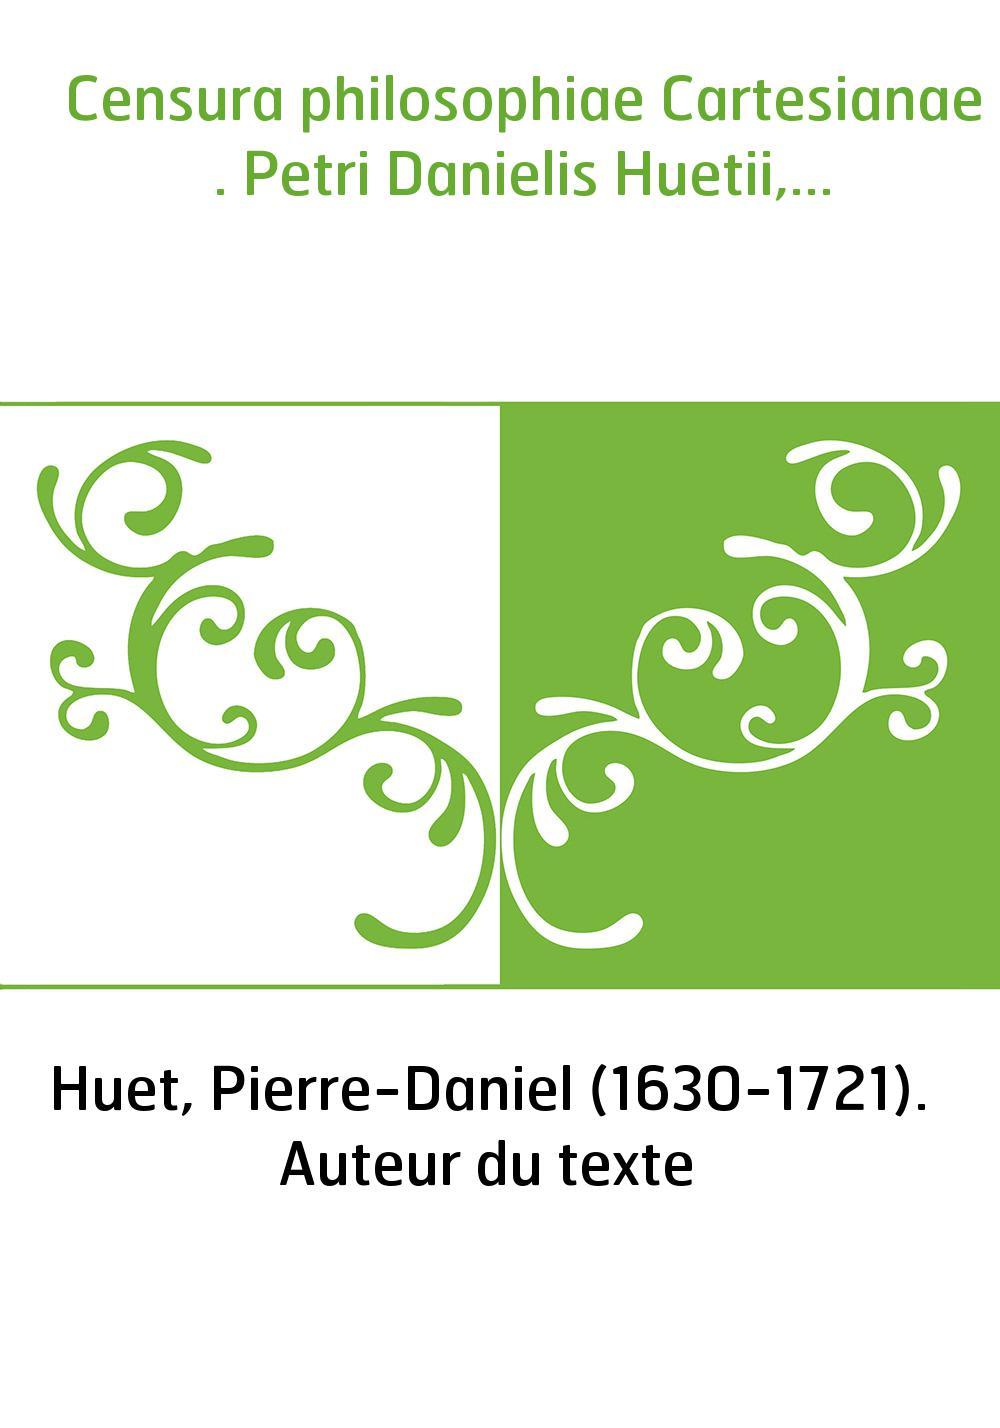 Censura philosophiae Cartesianae . Petri Danielis Huetii,...